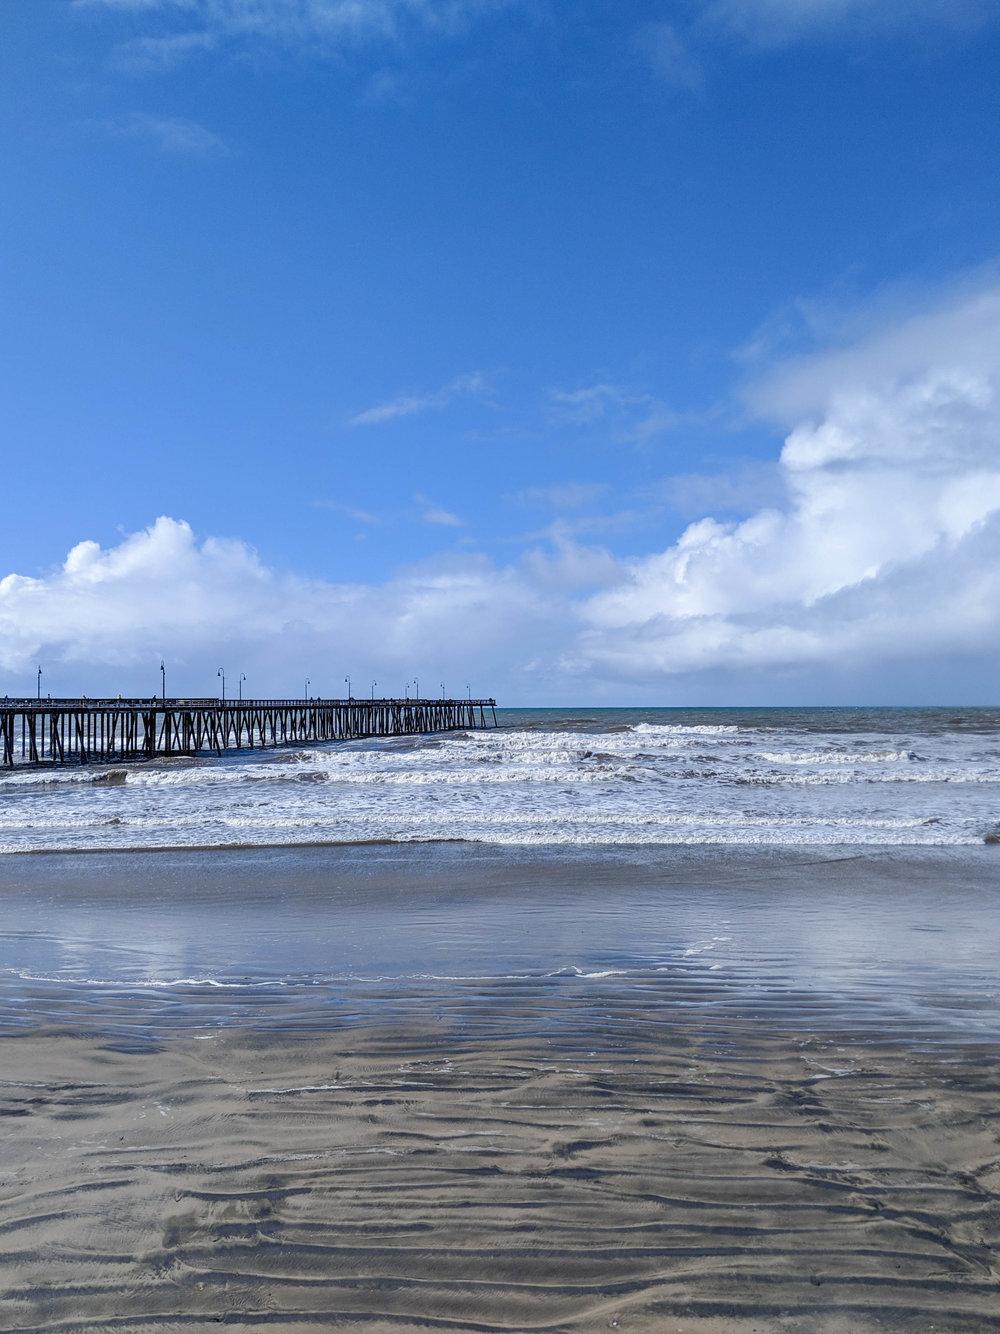 bri rinehart; photography; pismo beach; california; ocean; pier